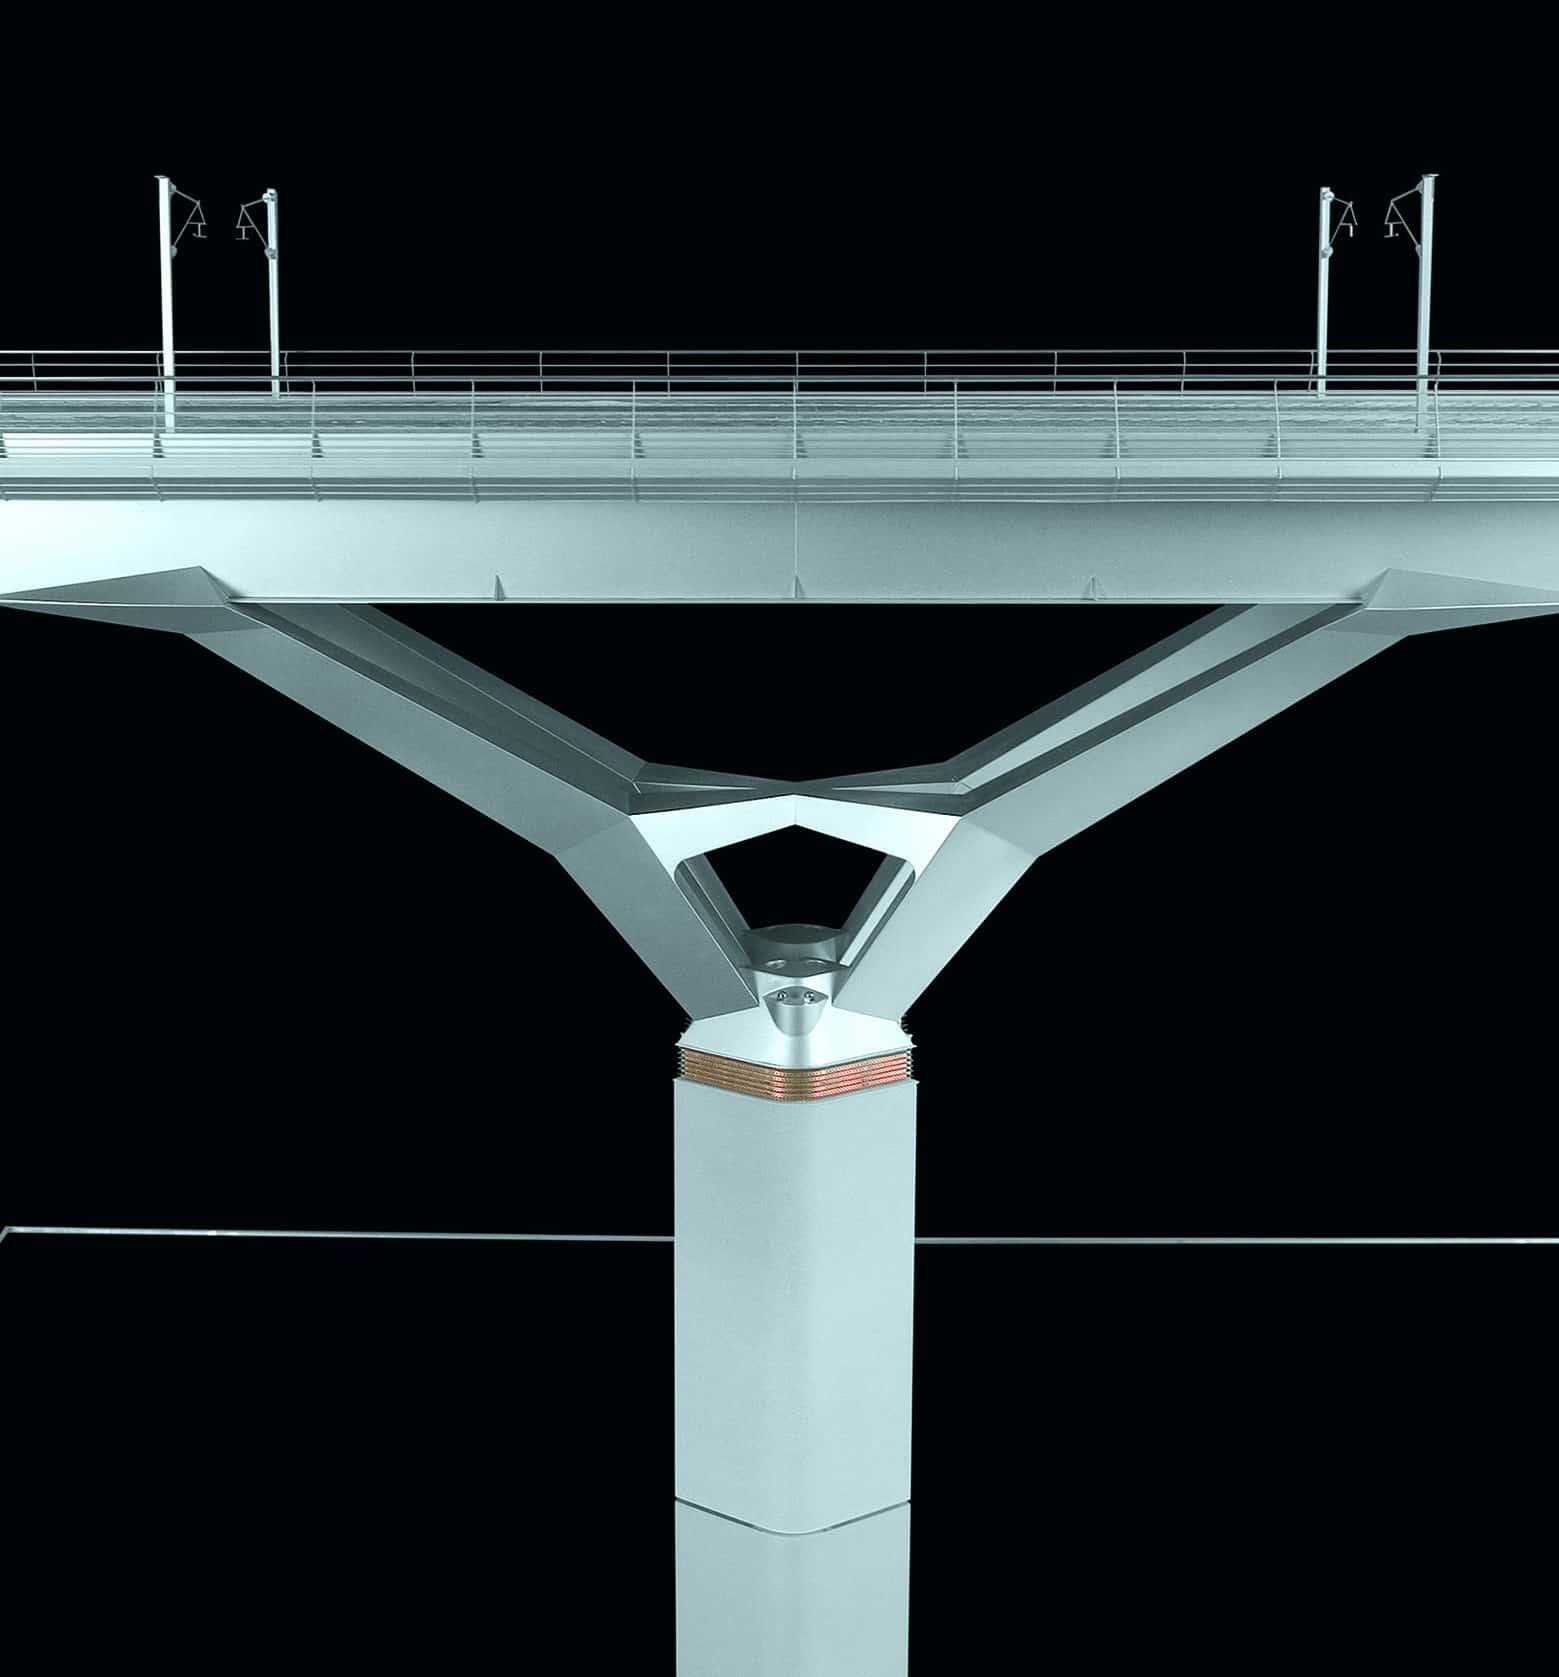 B+M Architecture - Savoureuse-étude 4